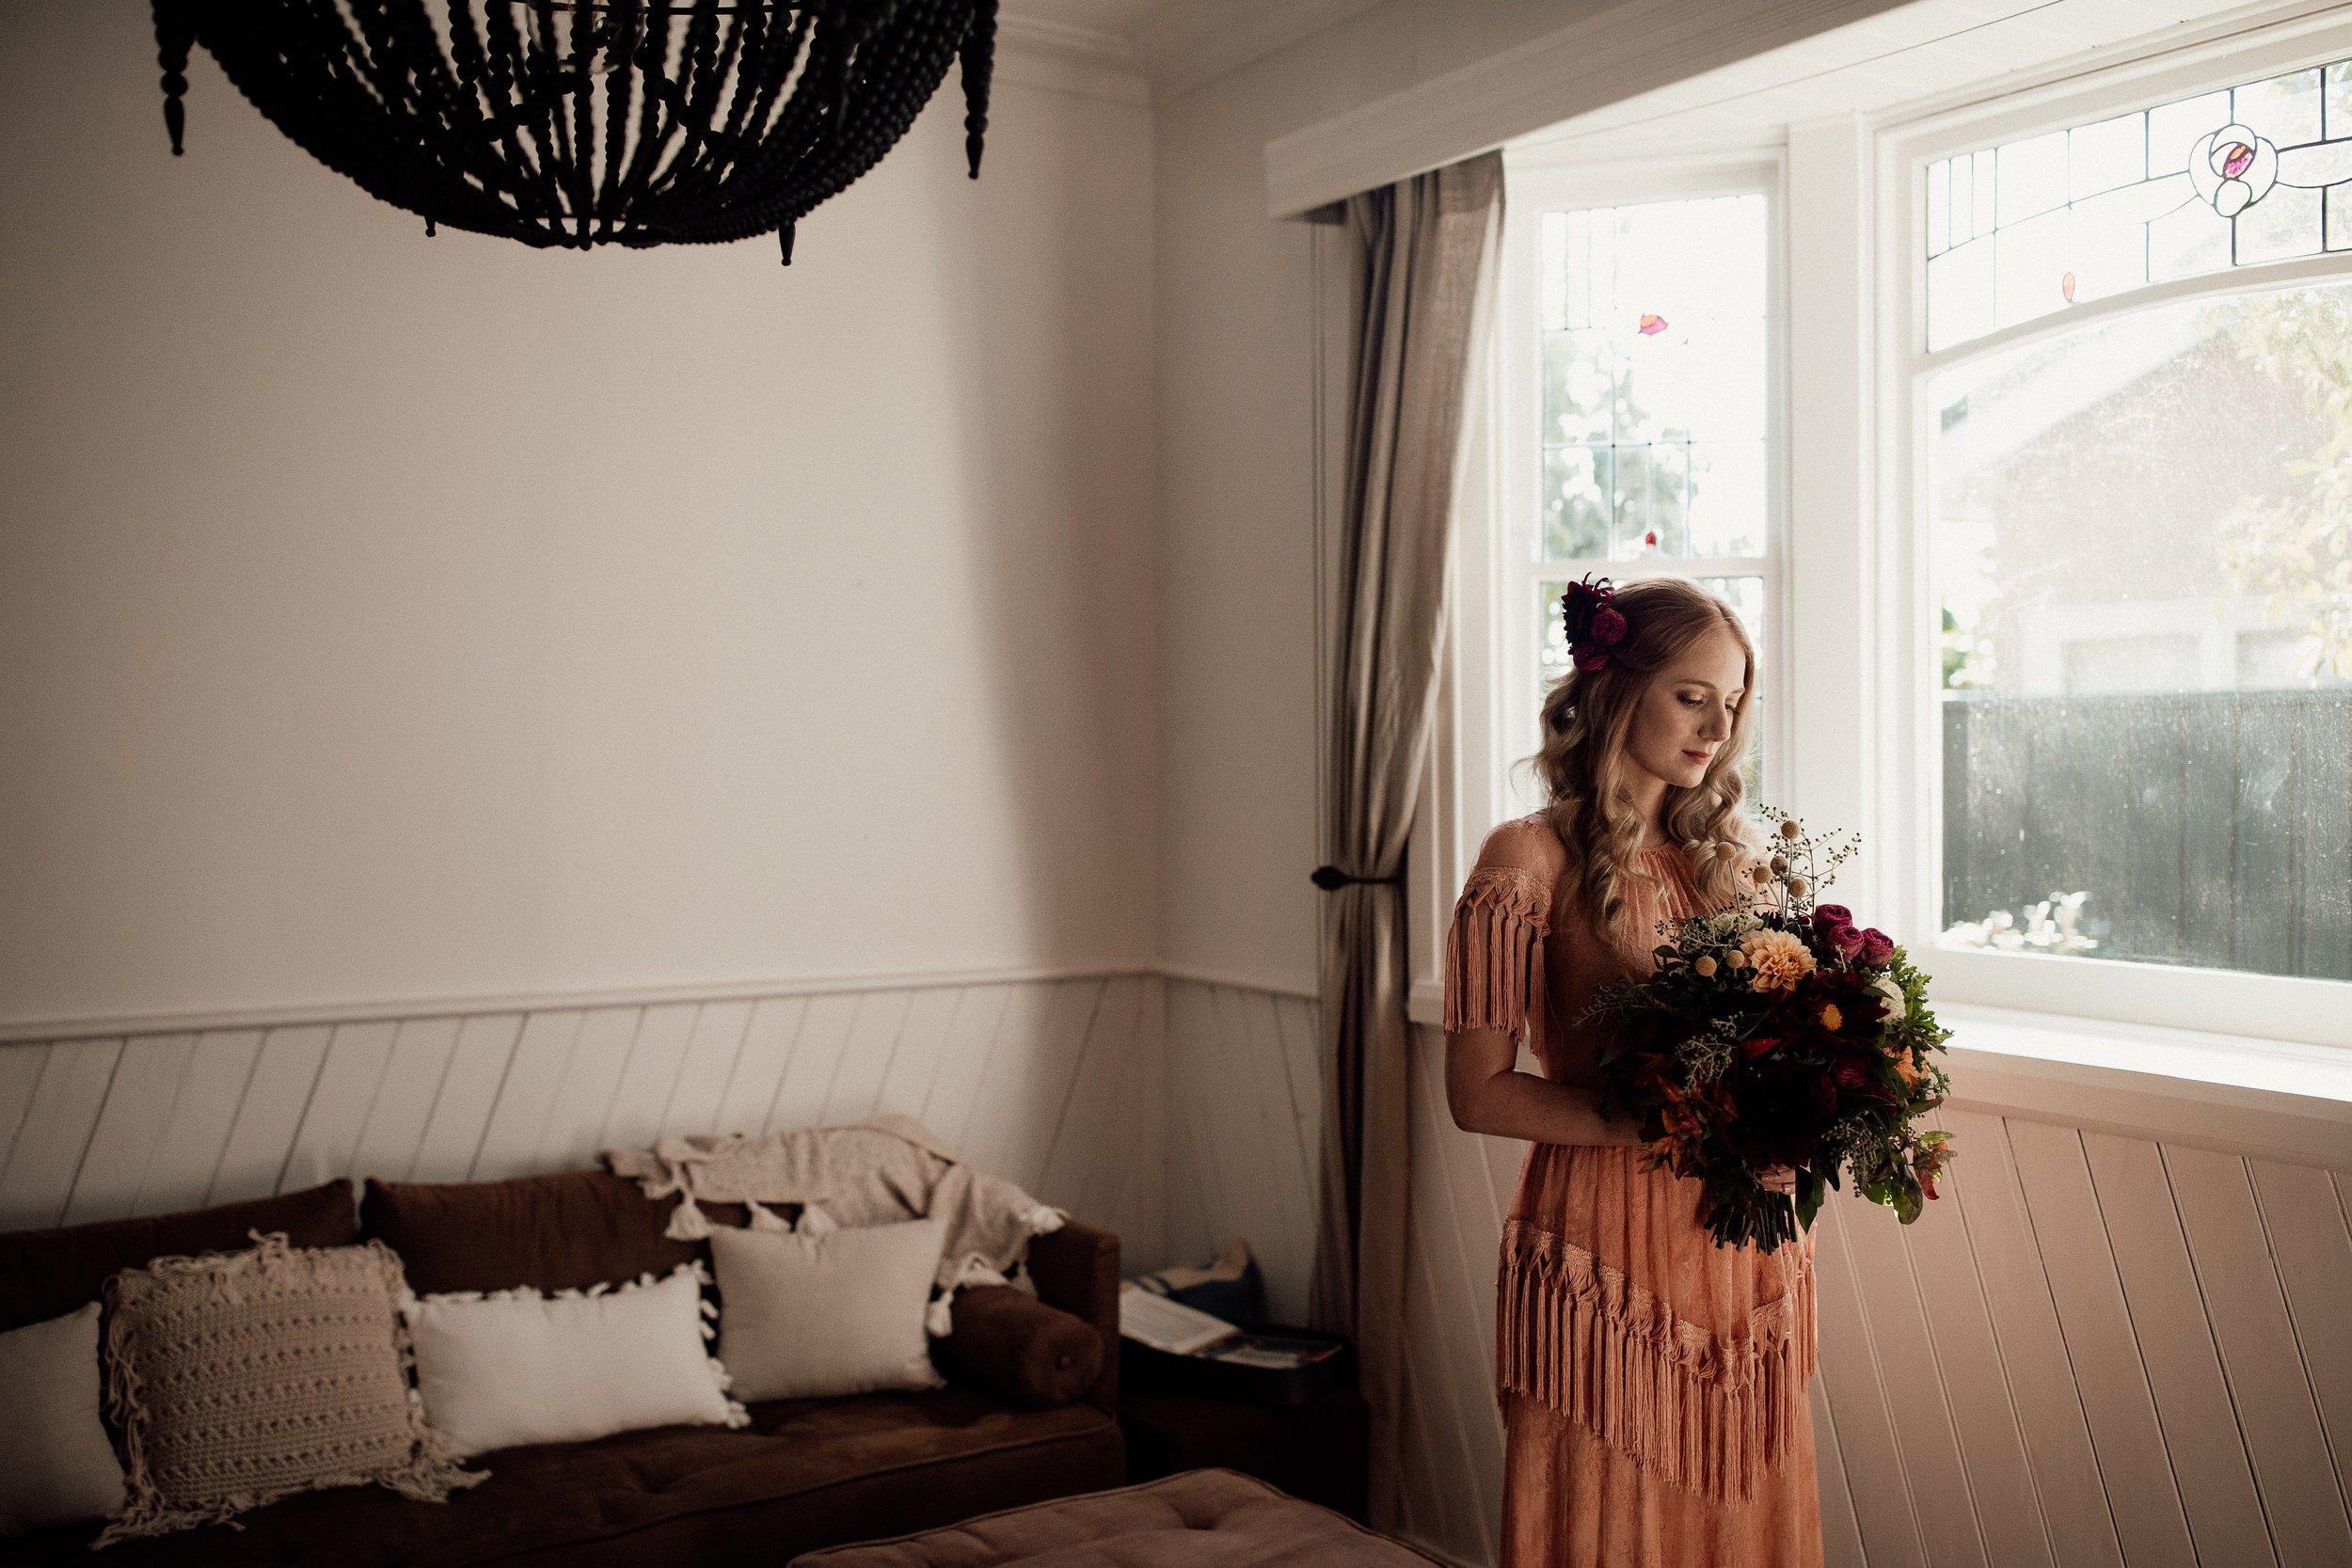 mickalathomas_puremacphotography_weddingphotographer_couplephotographer_Sheppartonphotographer_2118.jpg